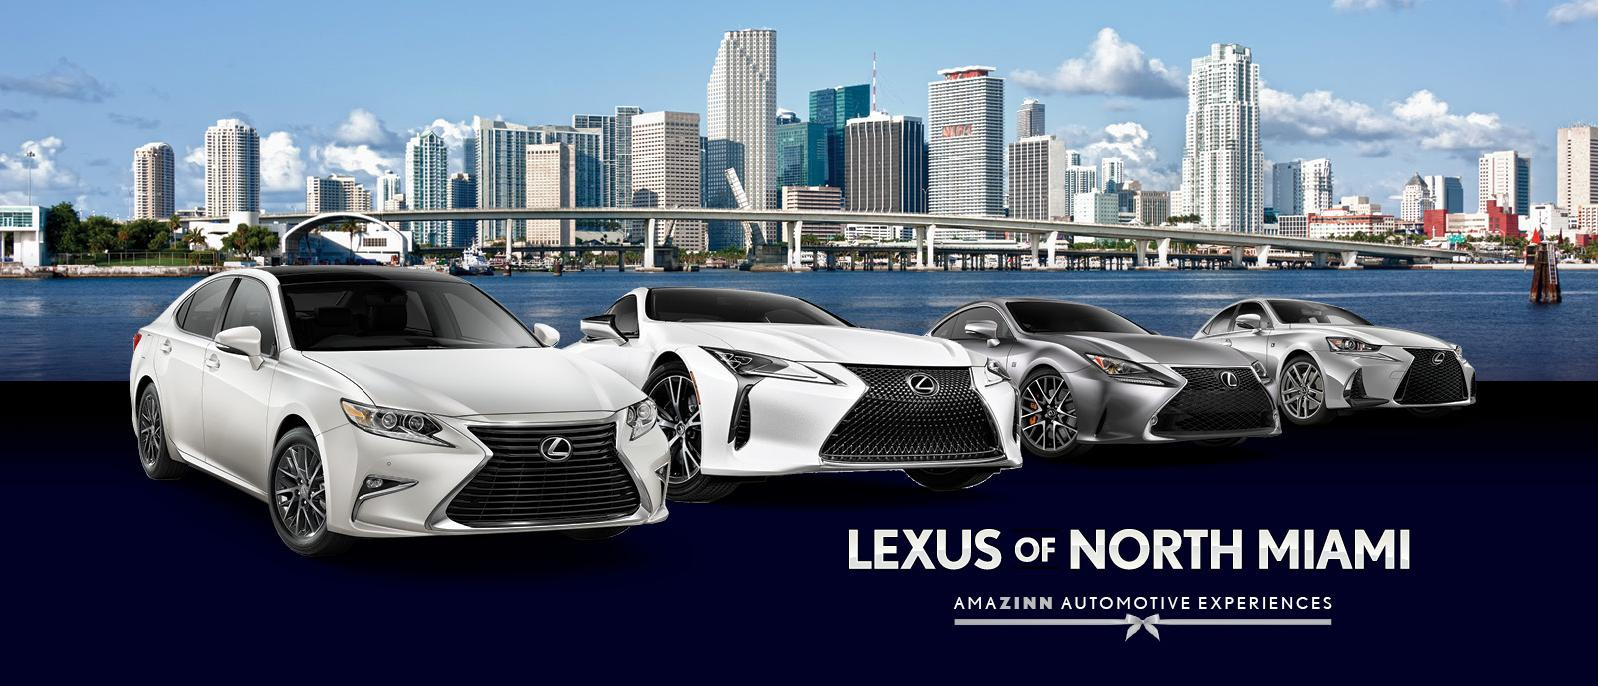 Lexus-Specials